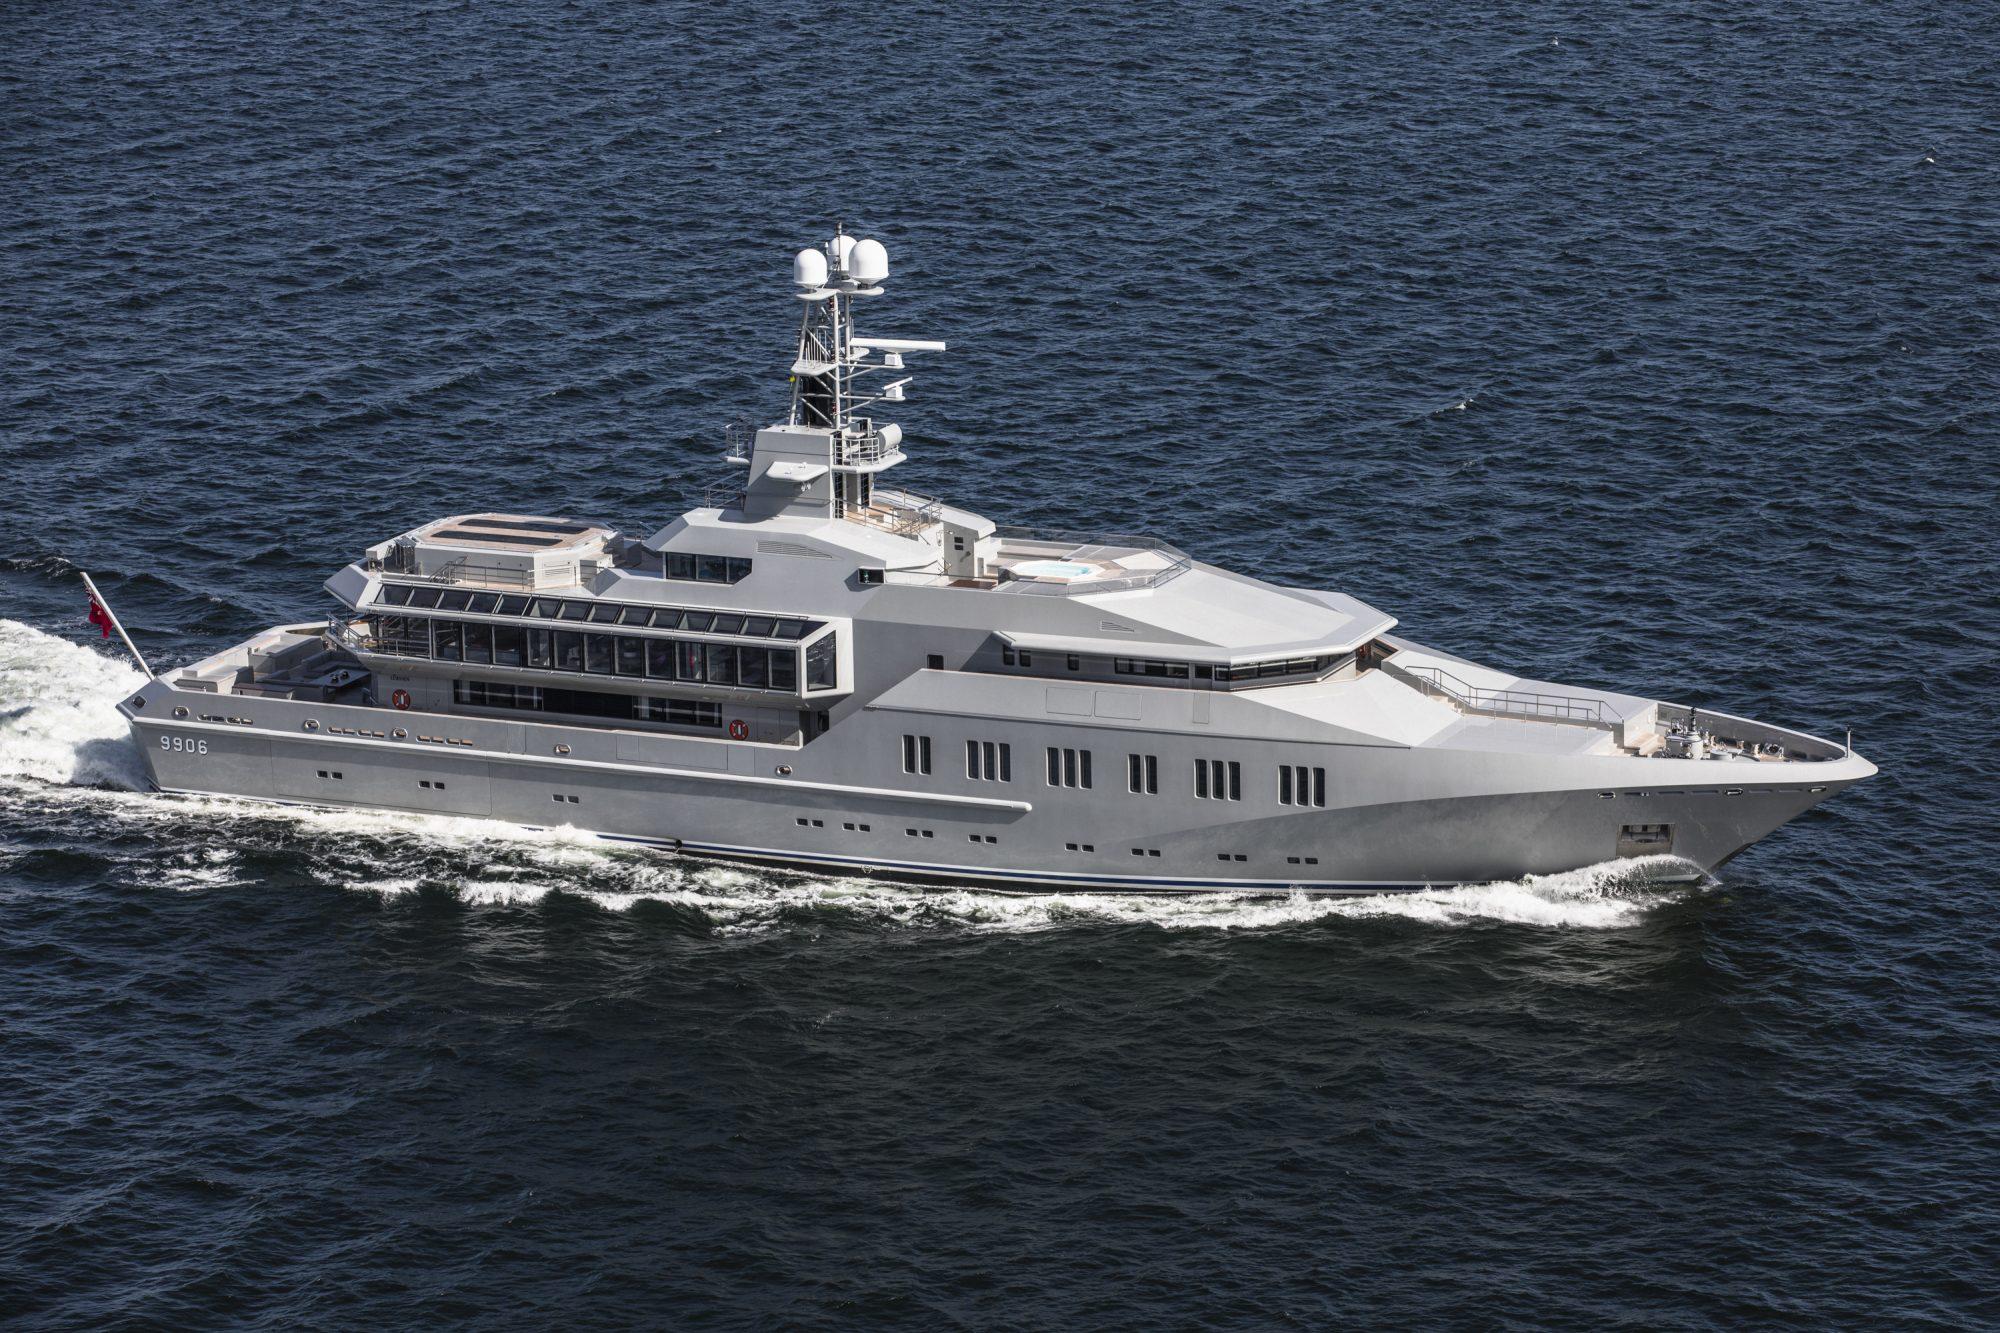 Motor Yacht SKAT for Sale with SuperYachtsMonaco